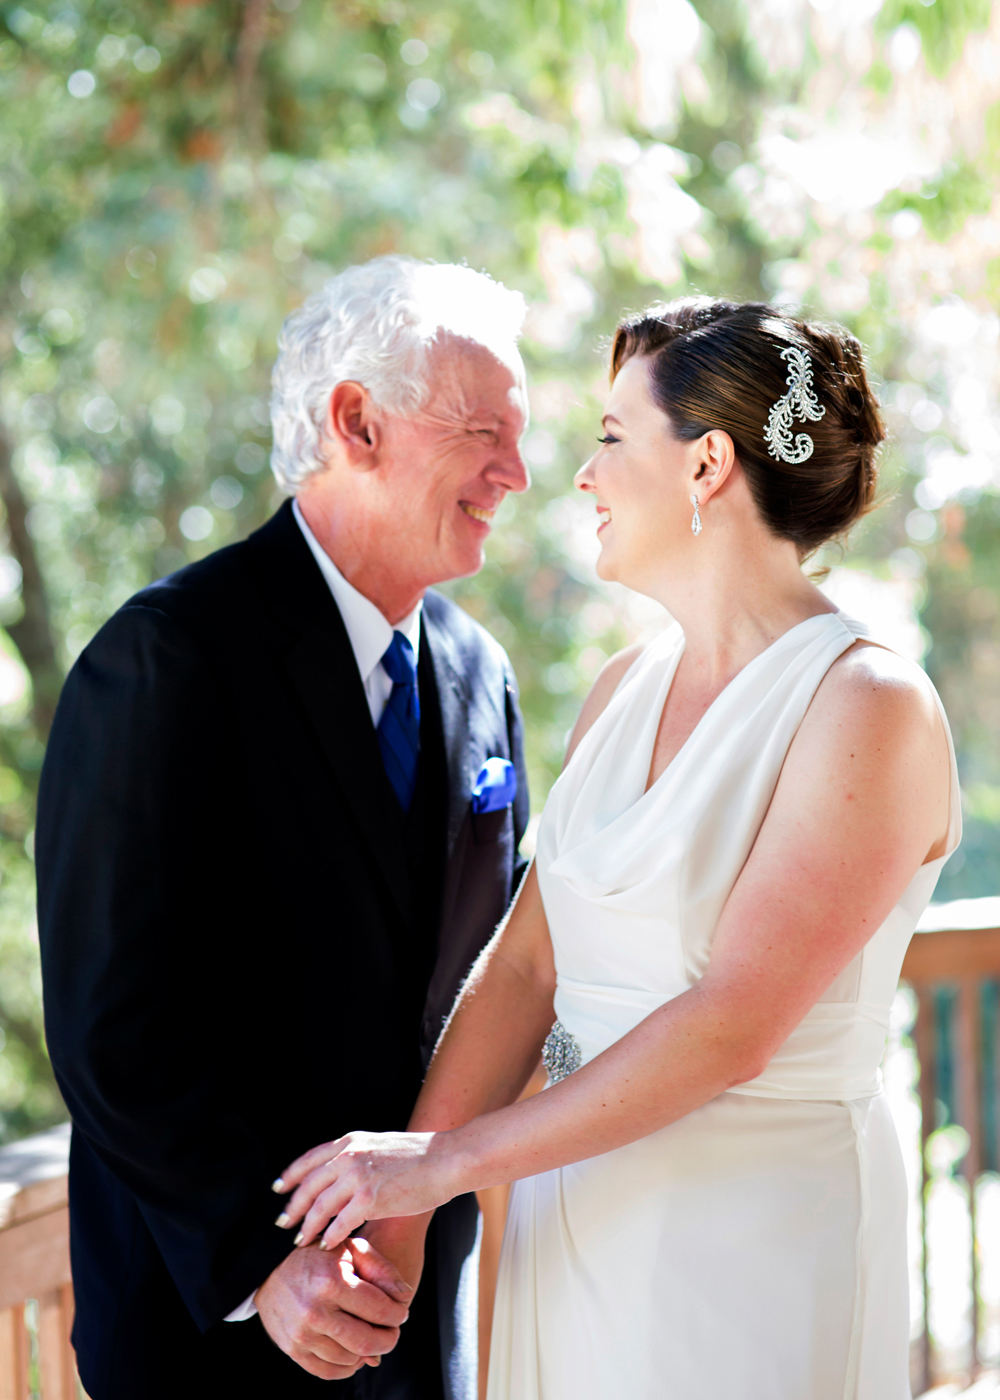 pema-osel-ling-santa-cruz-wedding-photography-lilouette-21.jpg